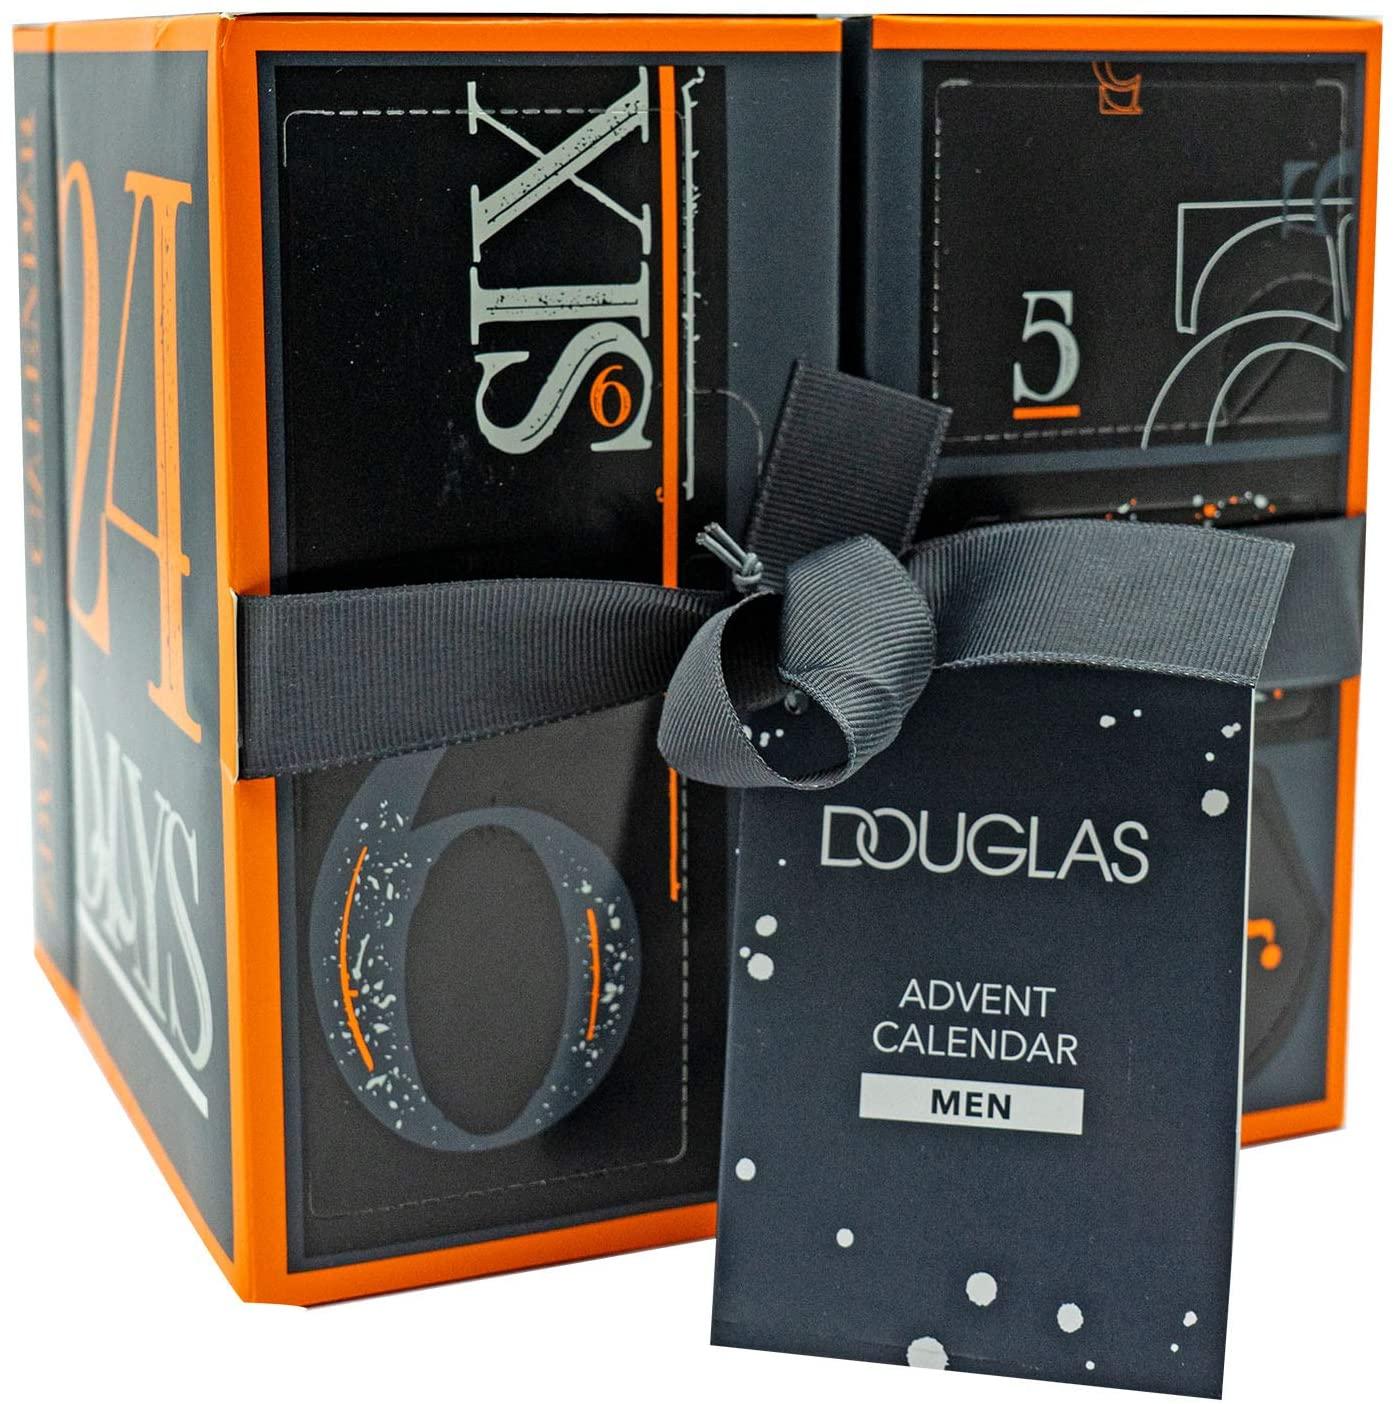 Douglas Men's Advent Calendar 2020